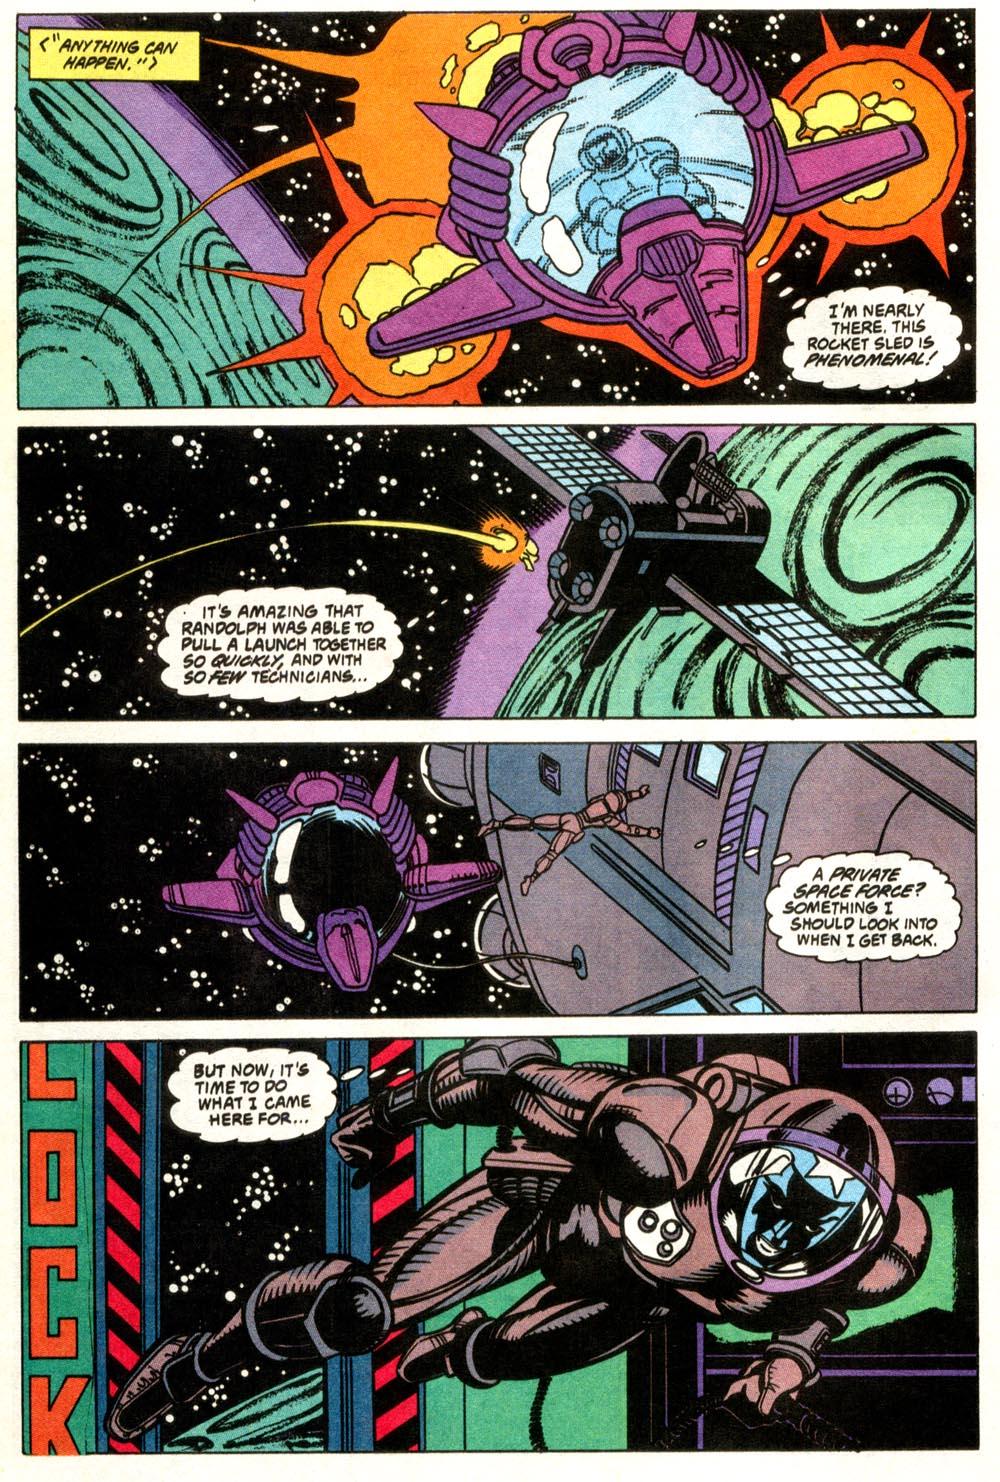 Read online Wonder Woman (1987) comic -  Issue #66 - 11